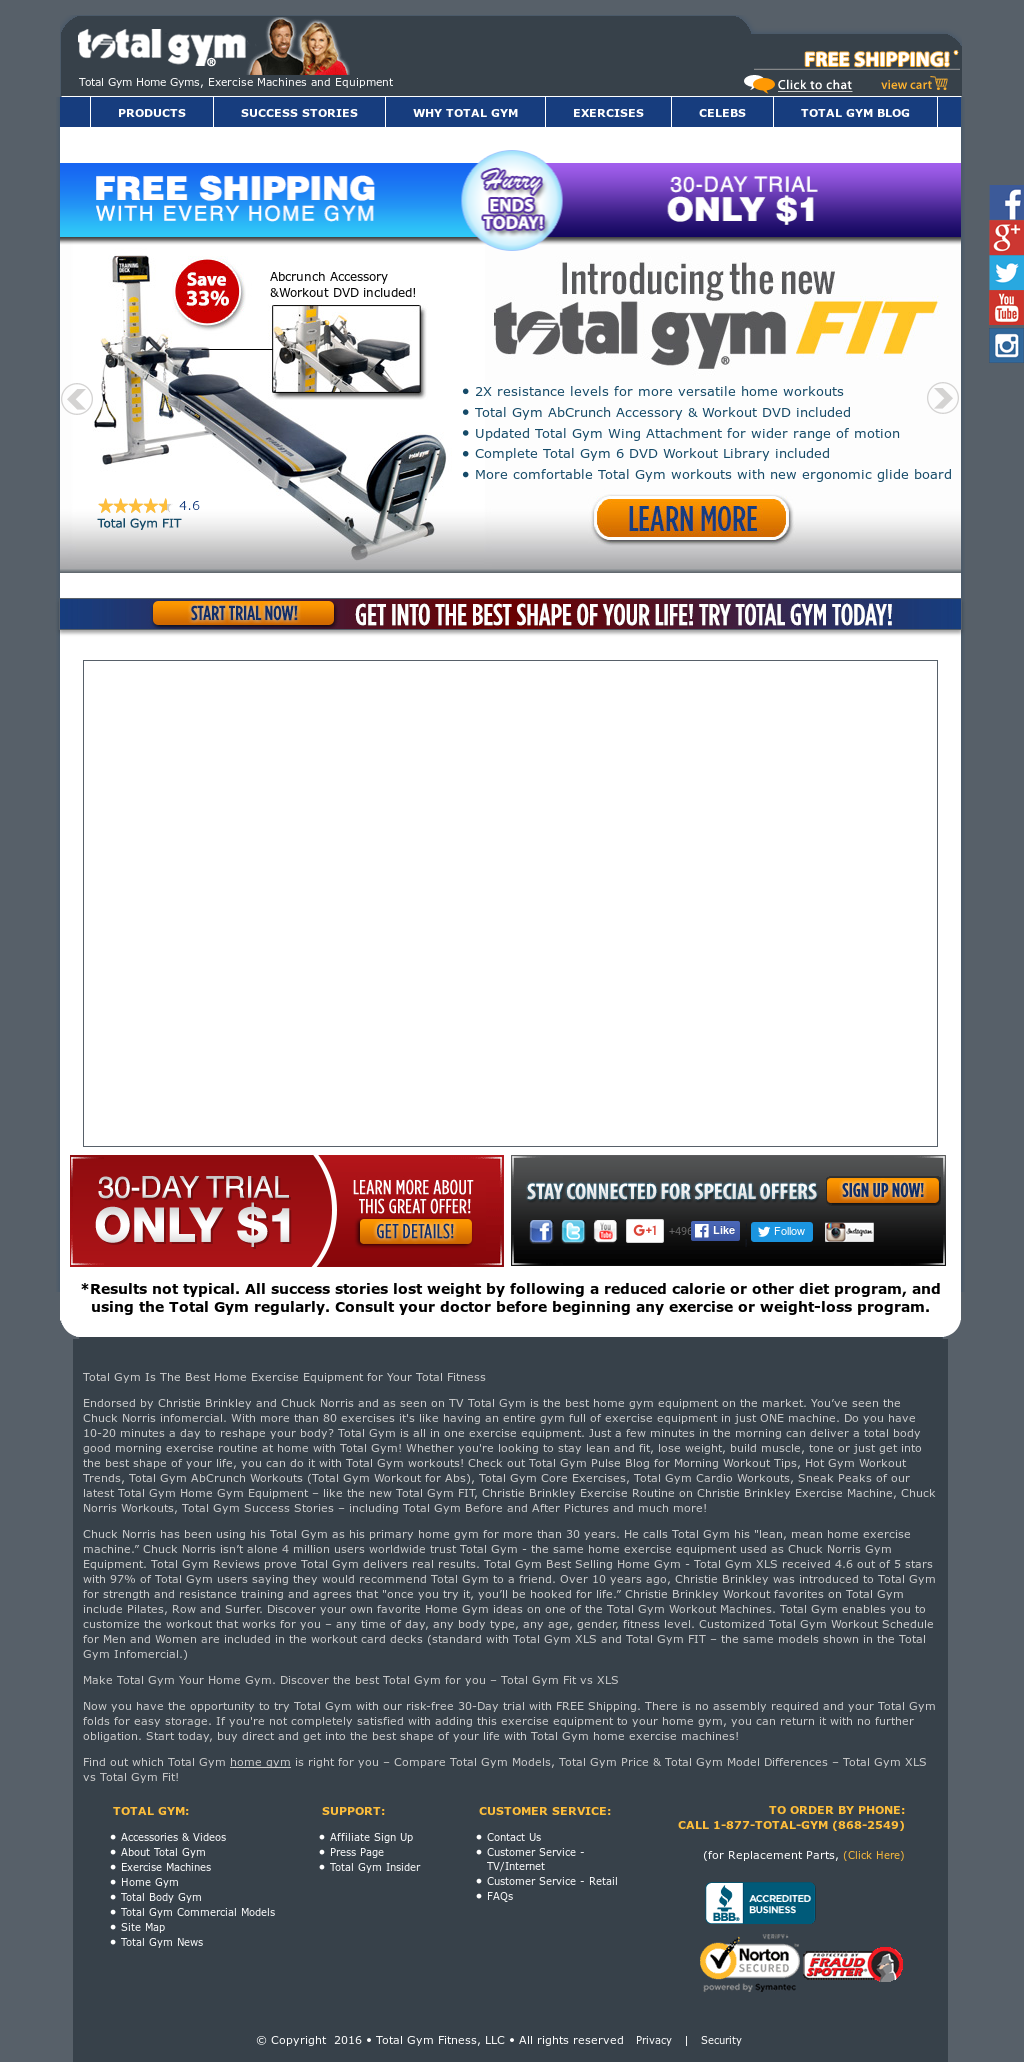 Total gym company profile owler for Gimnasio total